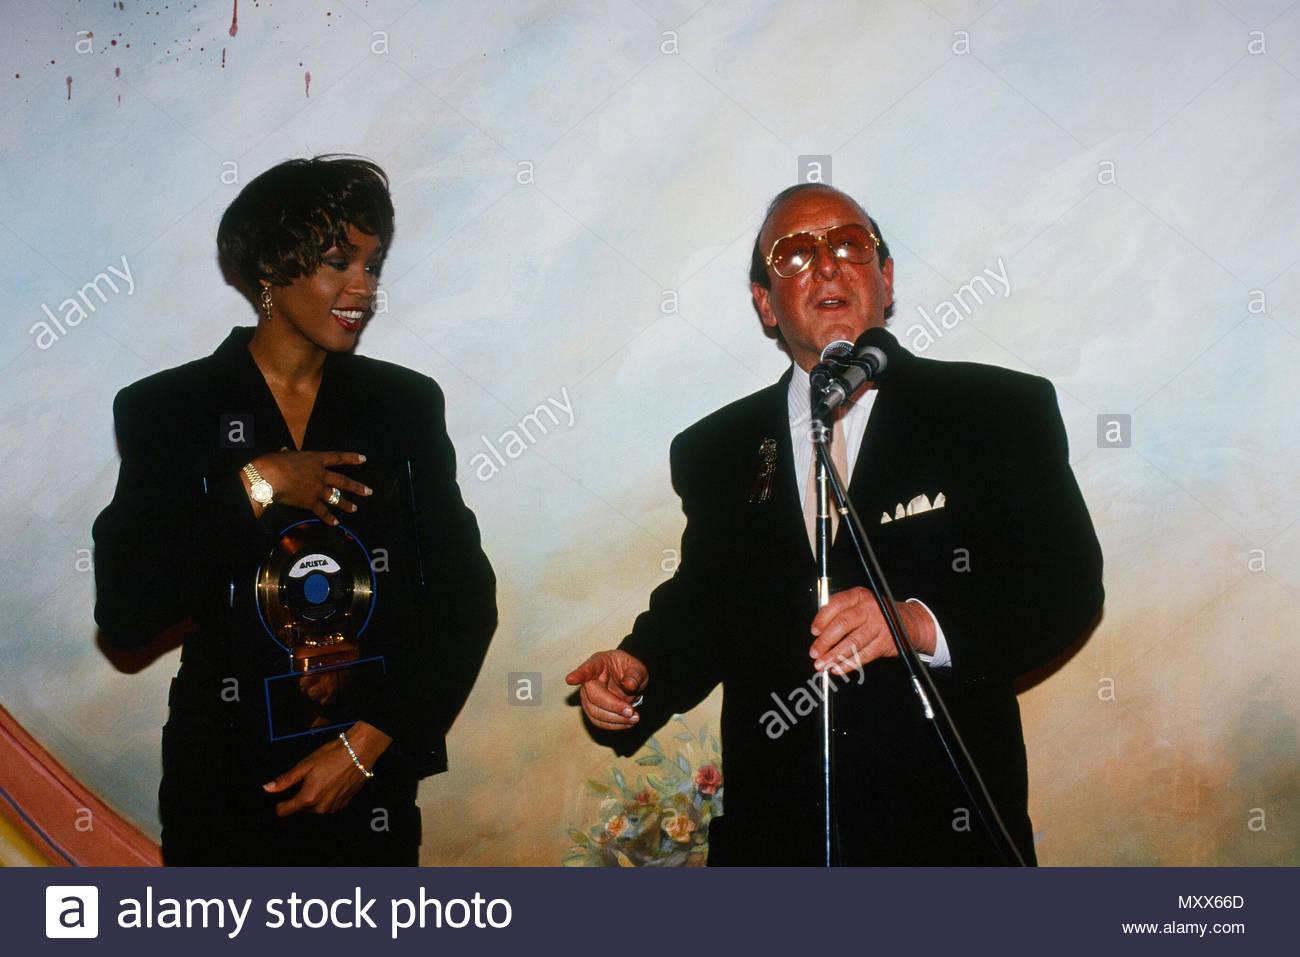 7 7 1990 Stockfotos & 7 7 1990 Bilder - Alamy